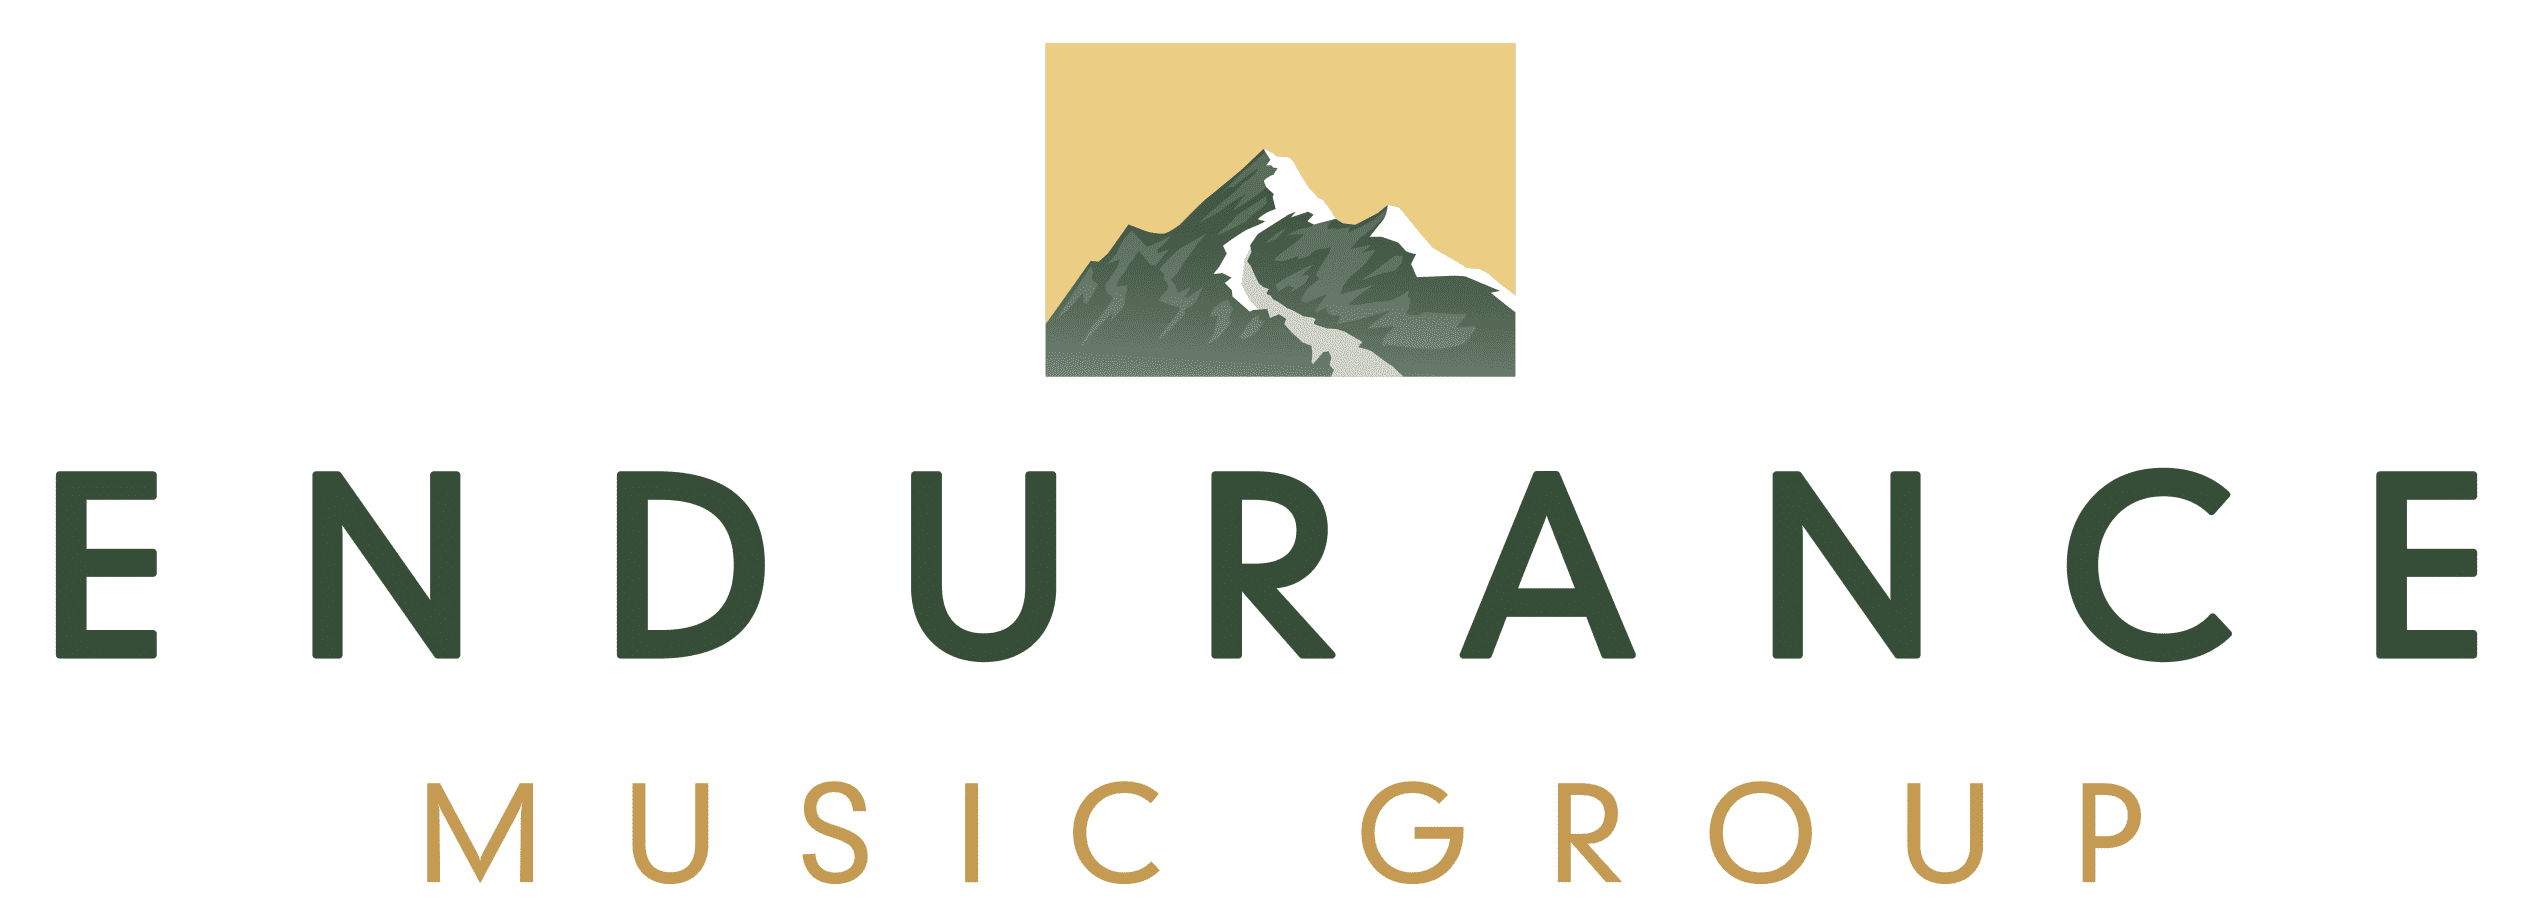 Endurance Music Group